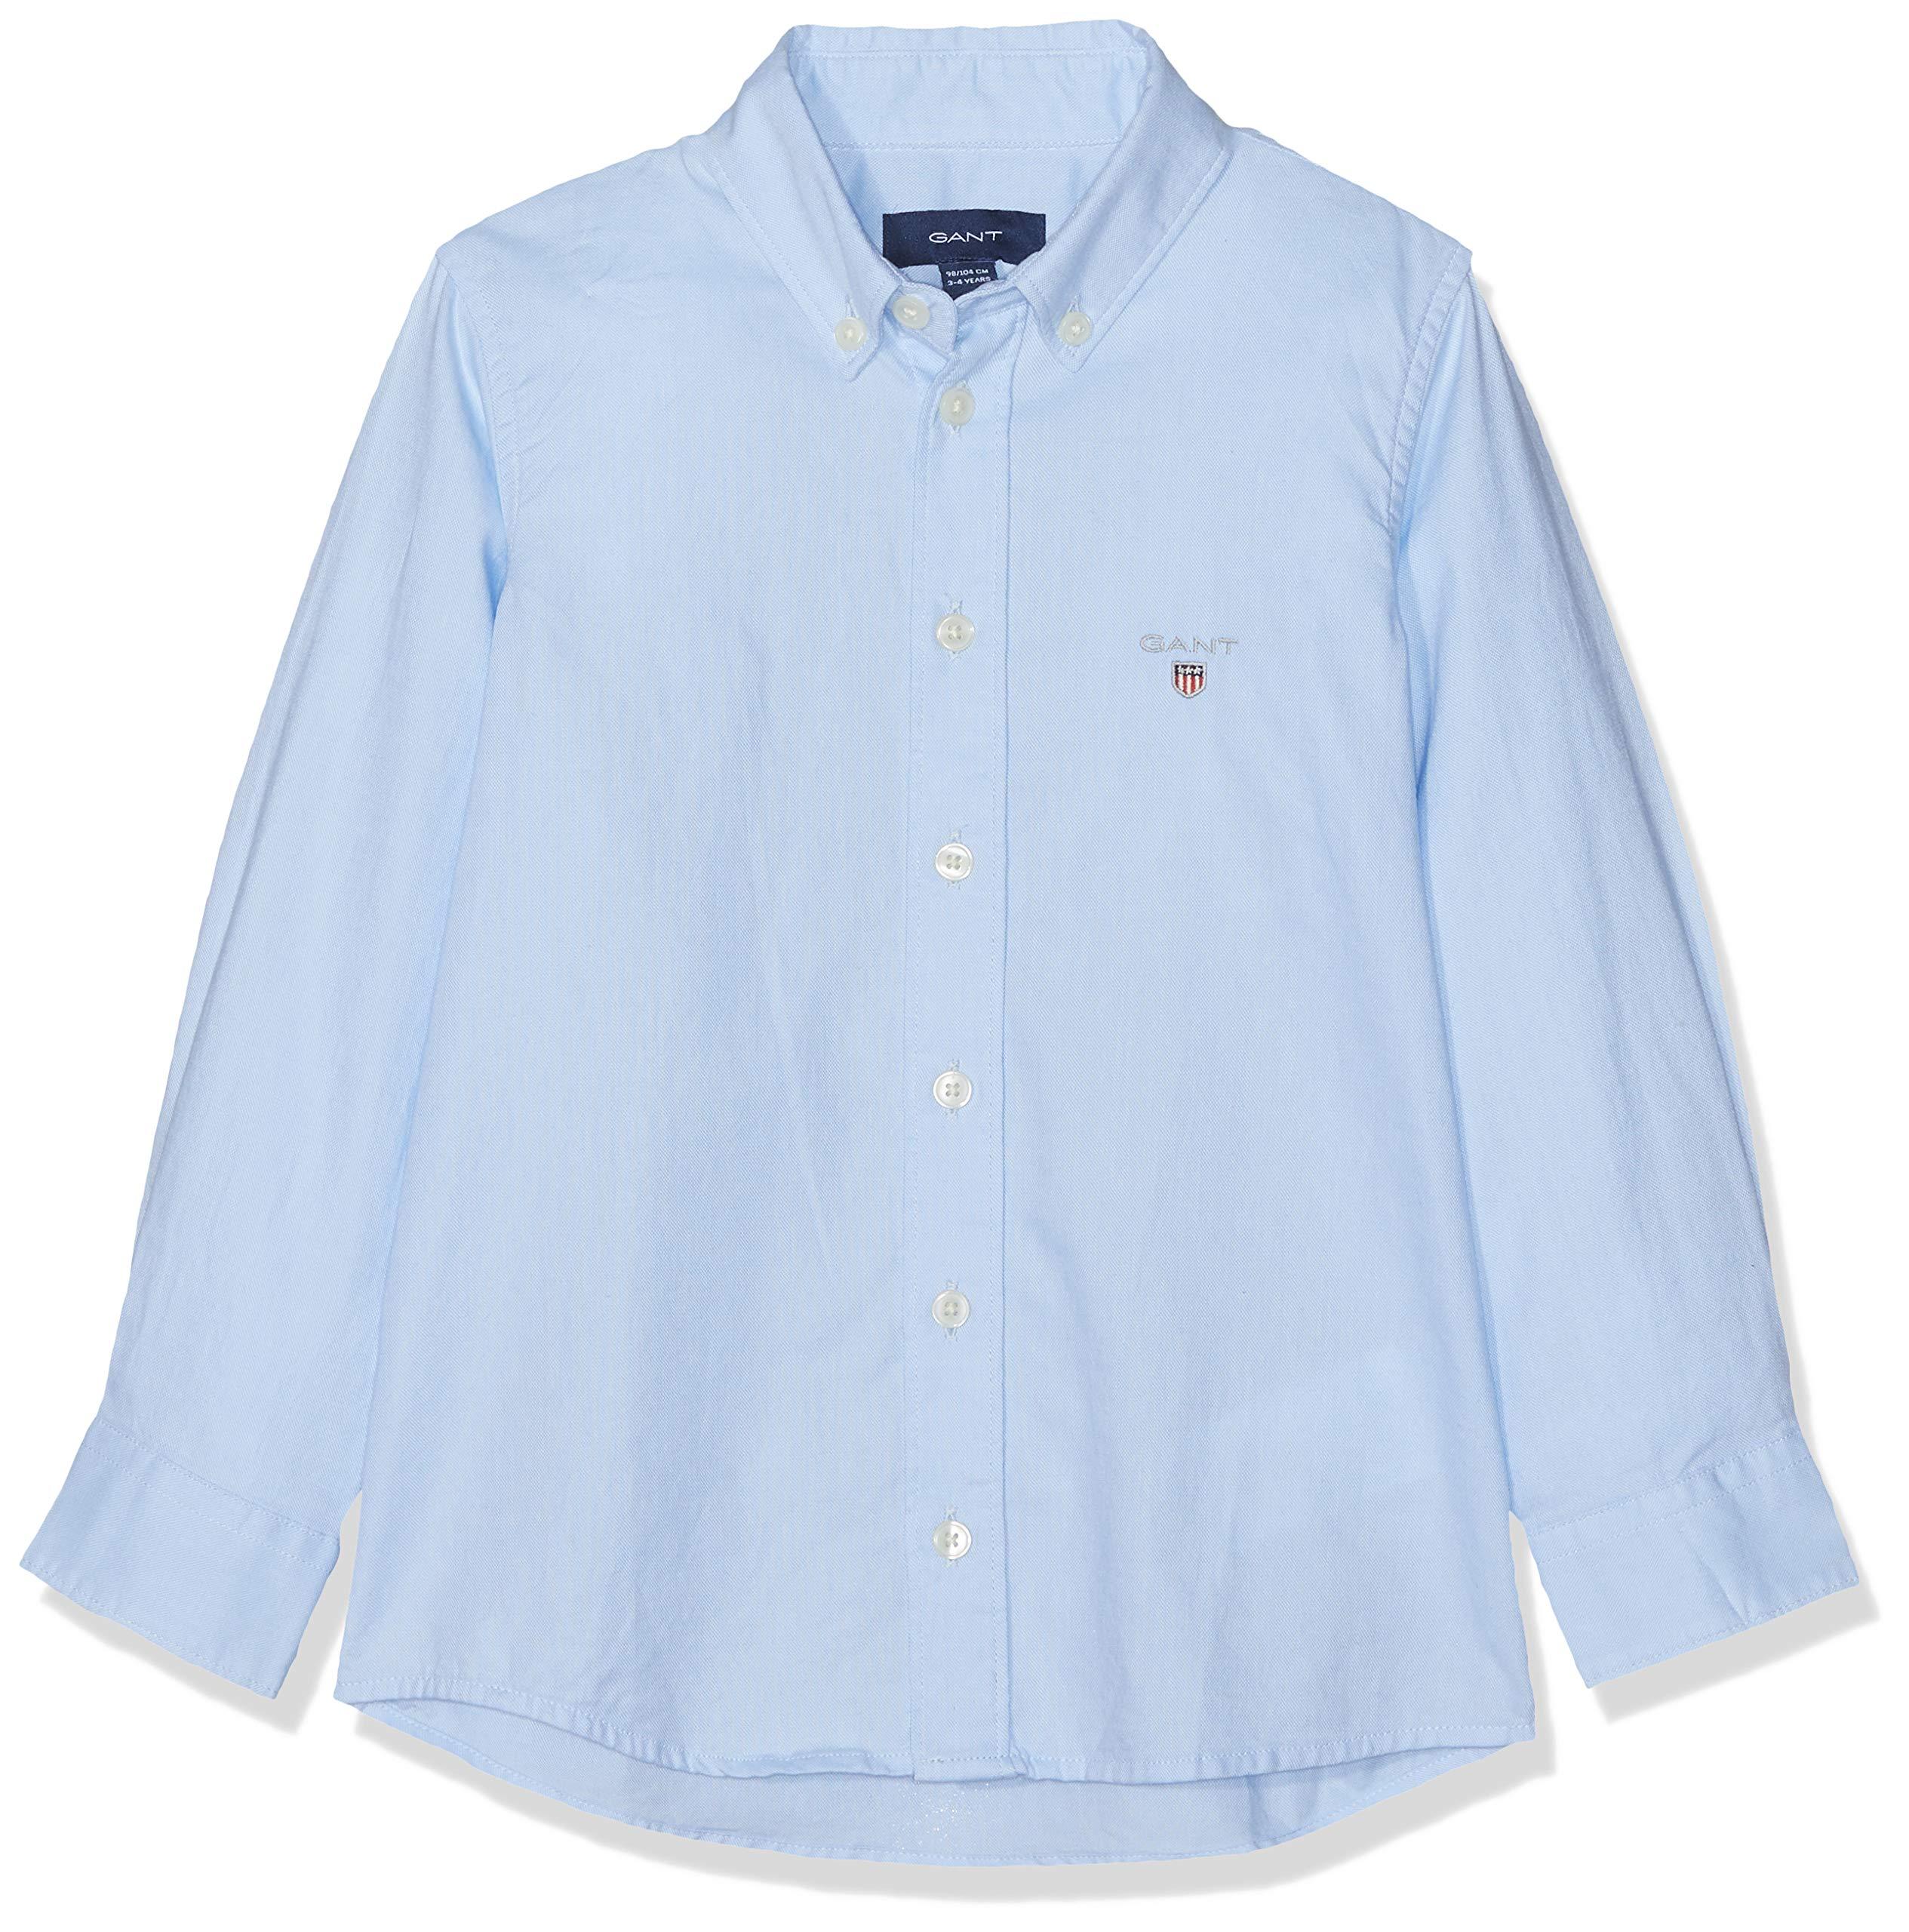 Boys' Shirt Long-Sleeved Light Blue 3 Years (98 cm)